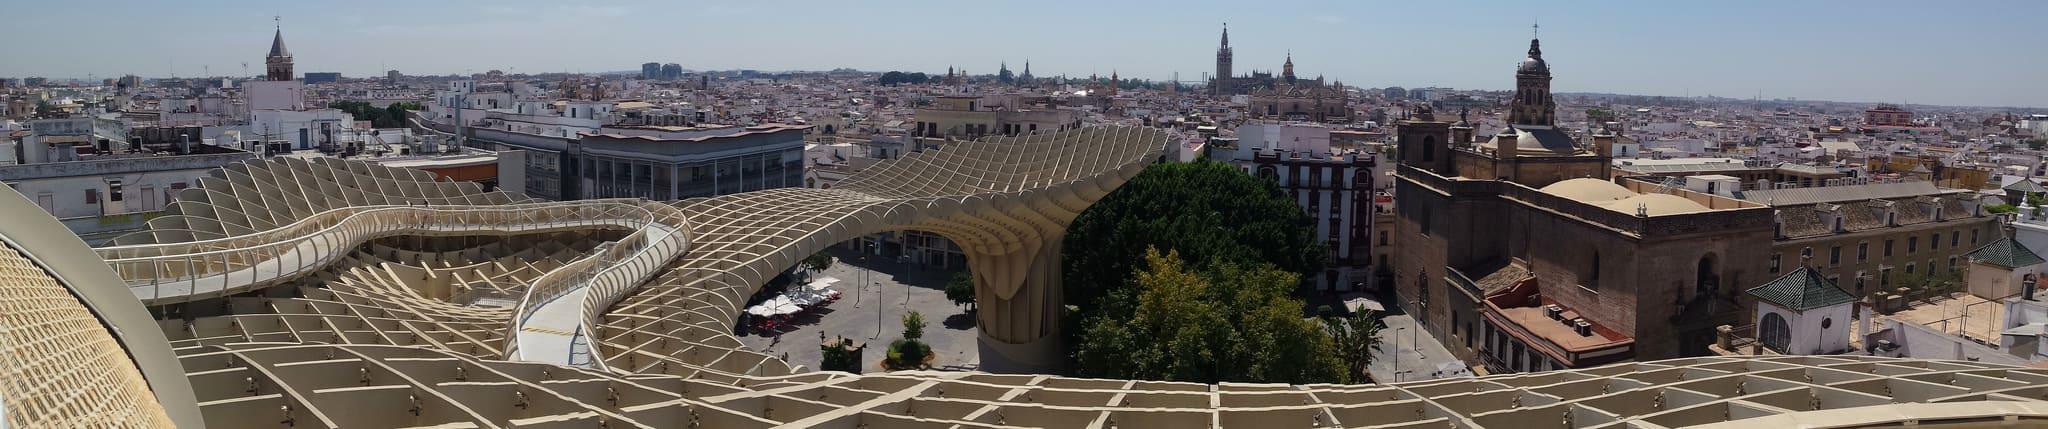 Andalusia Siviglia